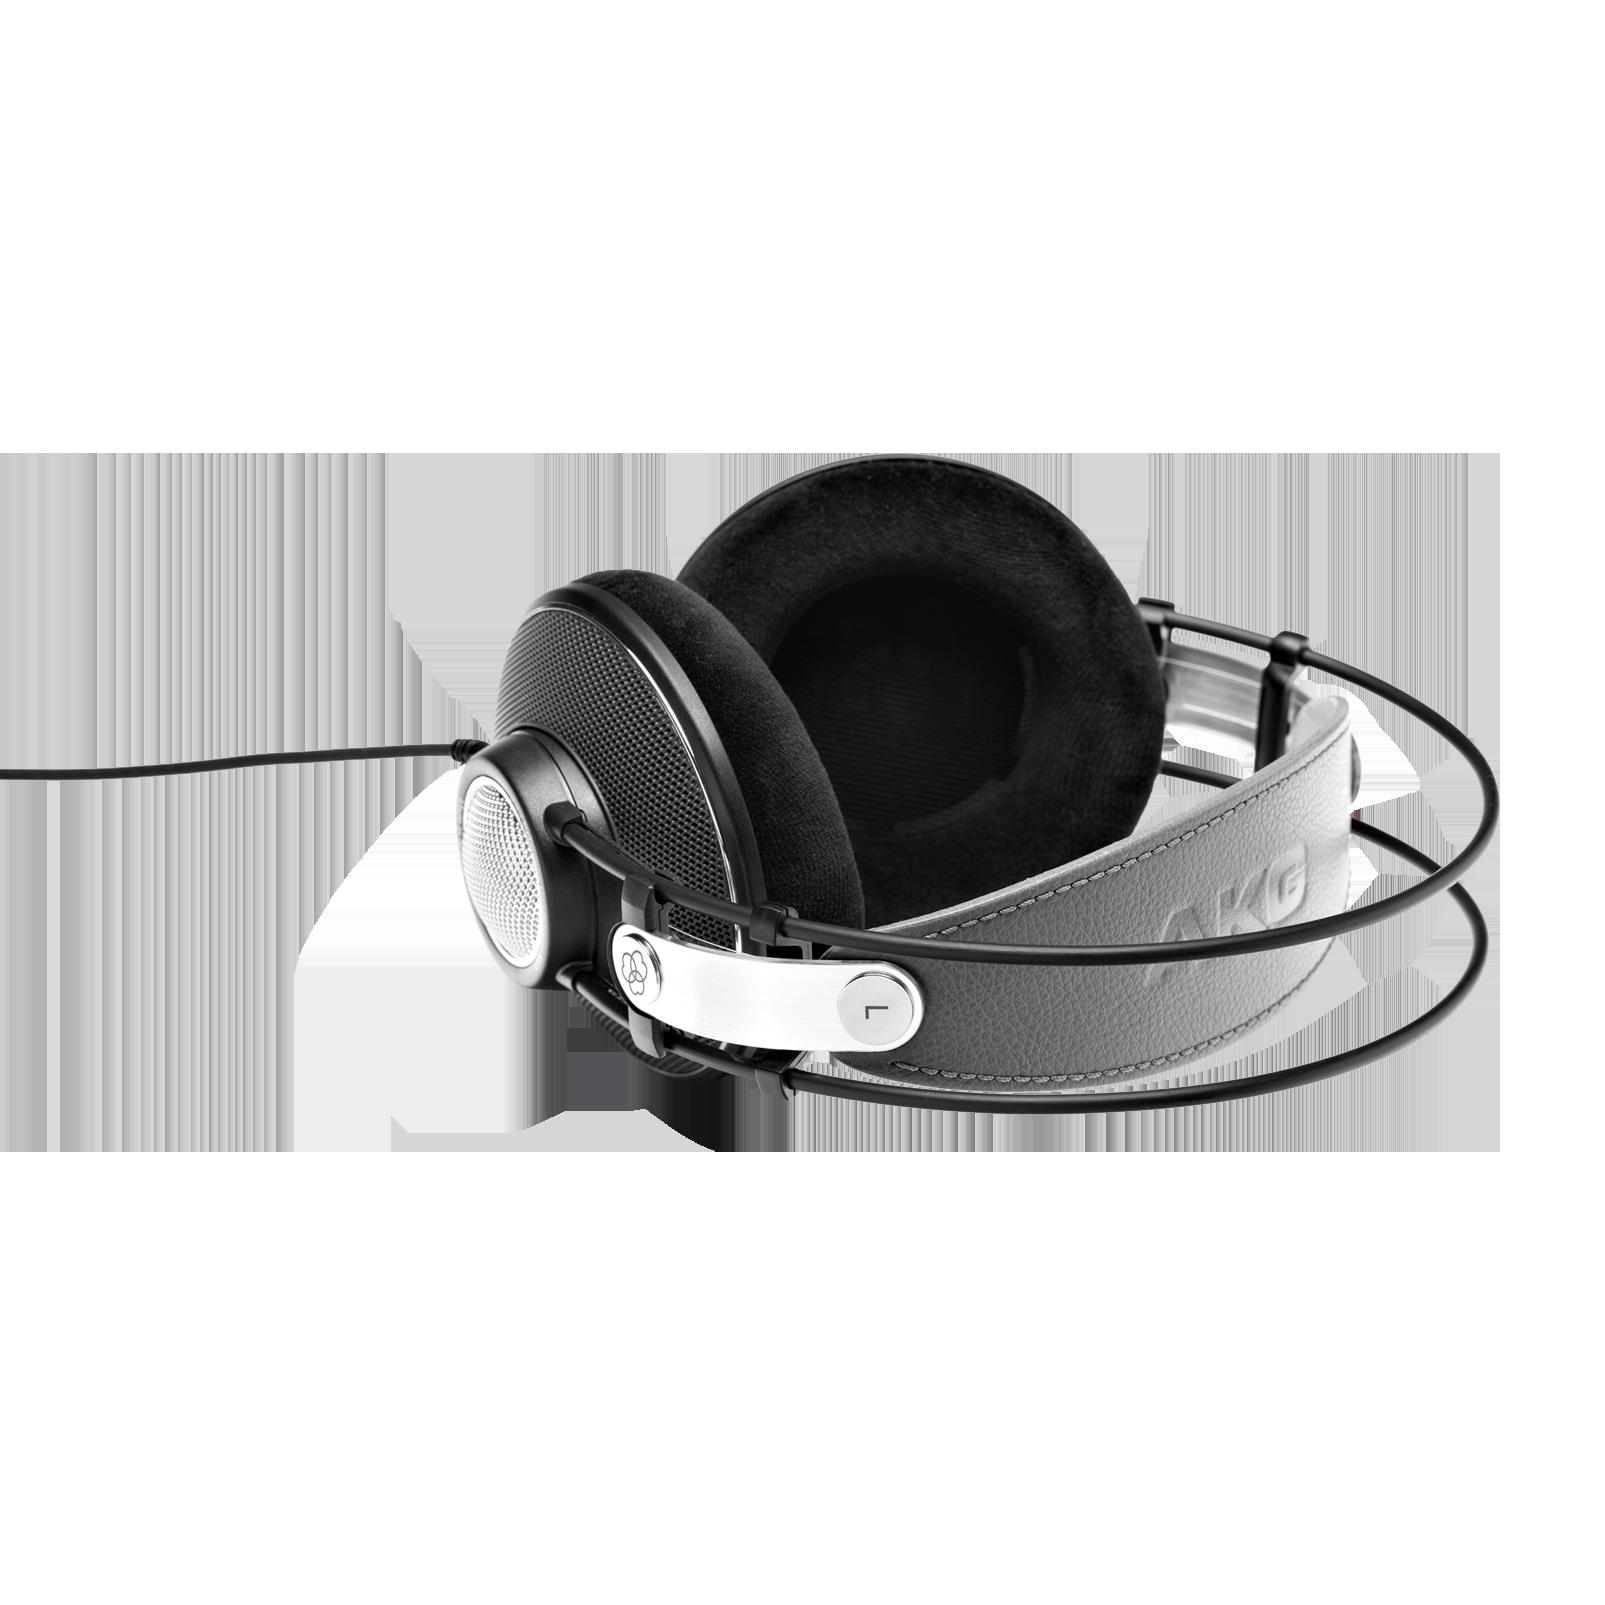 K612 PRO - Black - Reference studio headphones - Detailshot 1